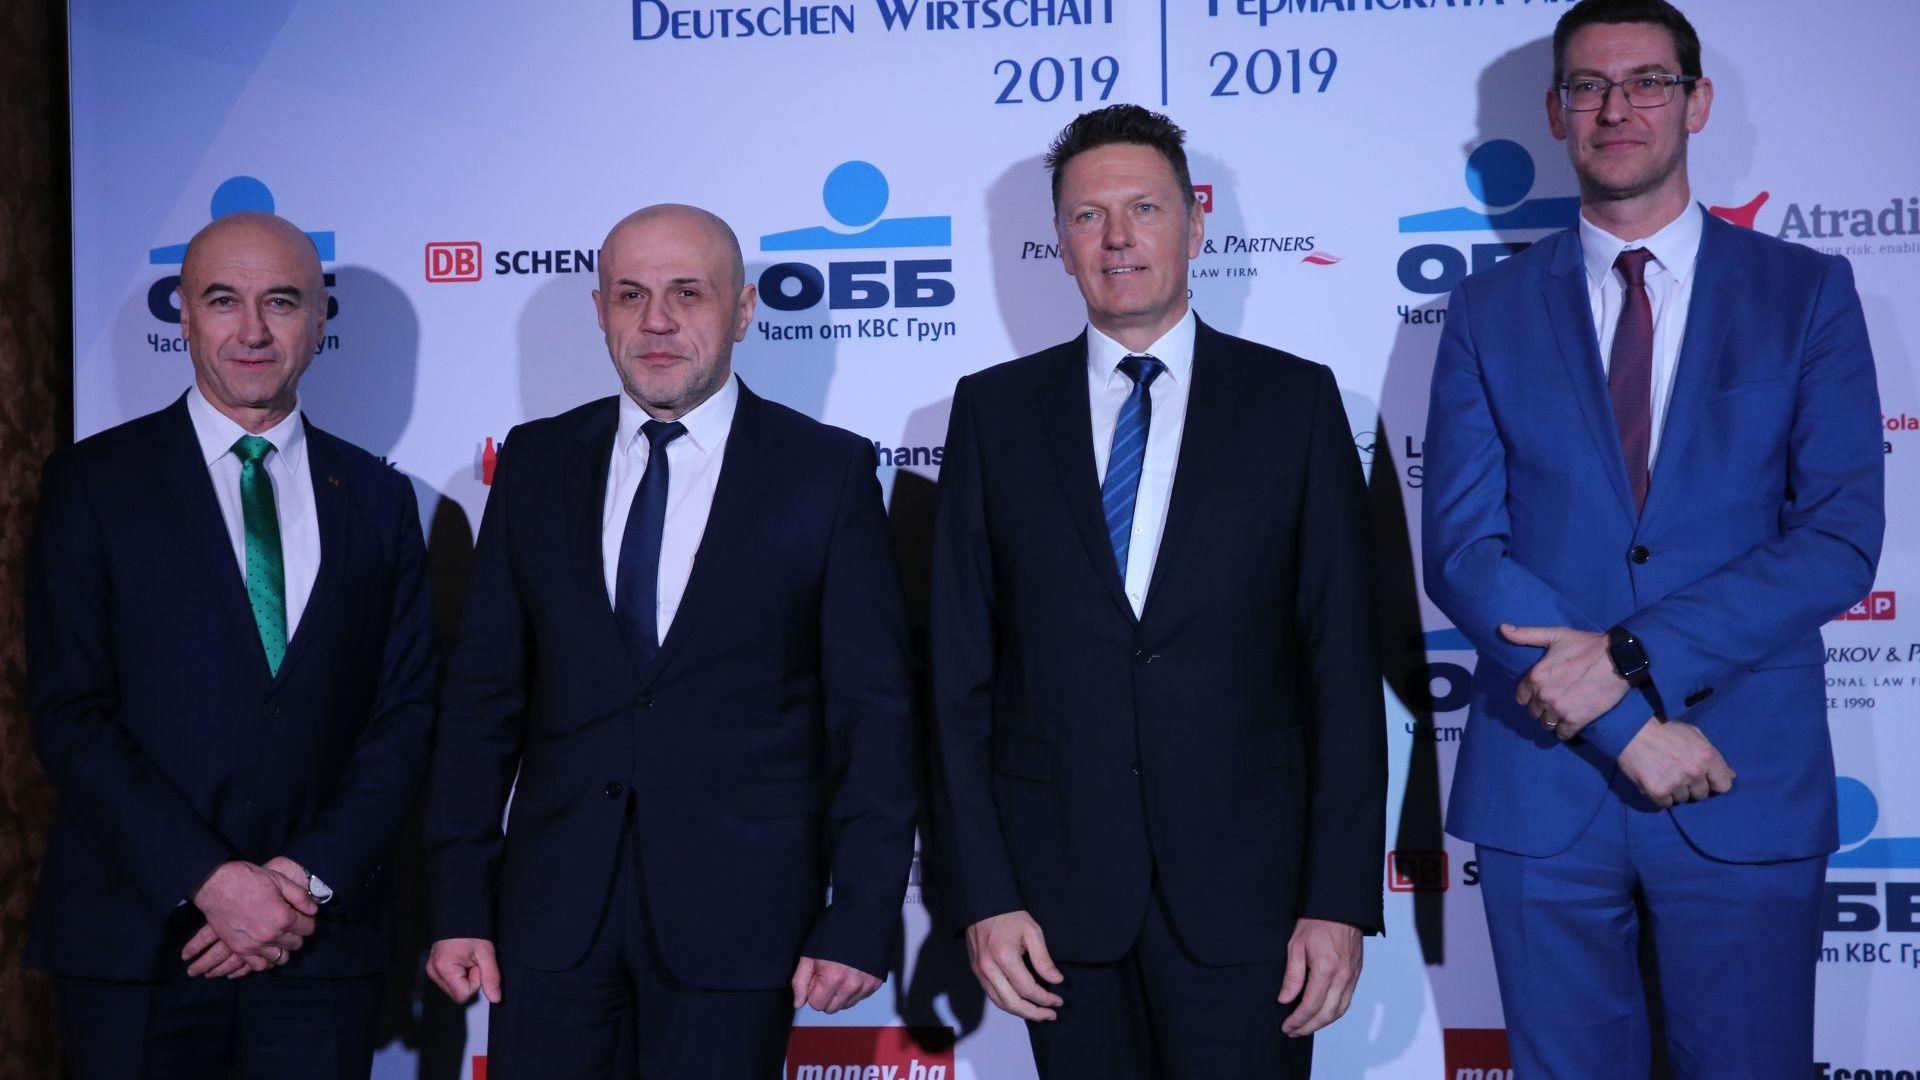 Томислав Дончев: Германия е стратегически икономически партньор на България